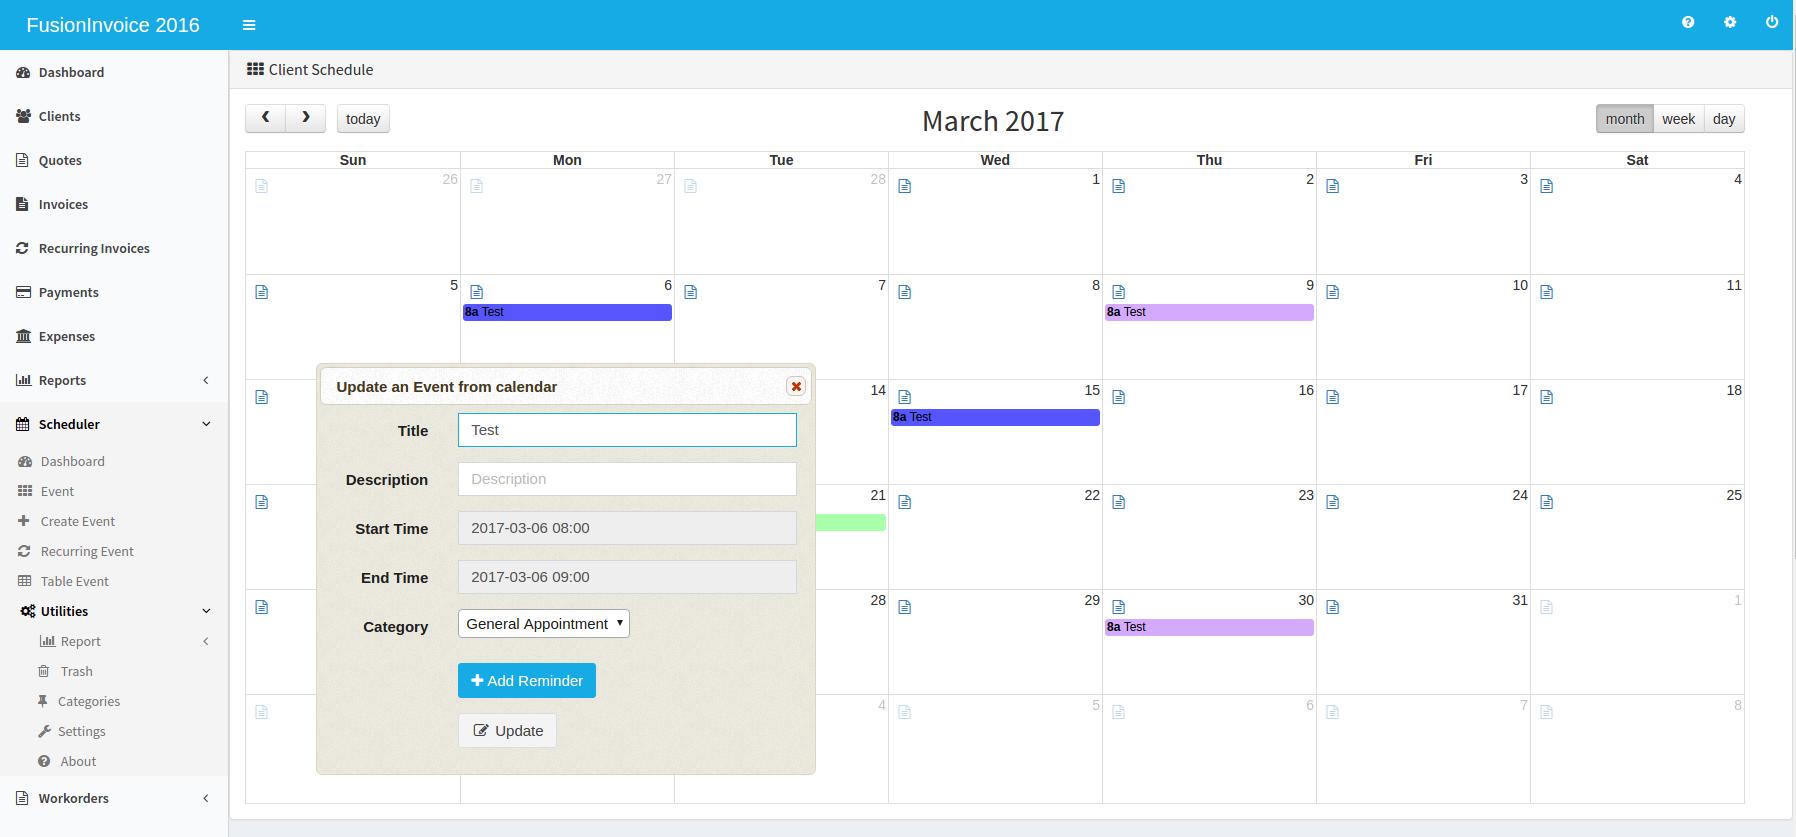 Scheduler Addon for FusionInvoice v2.1.1